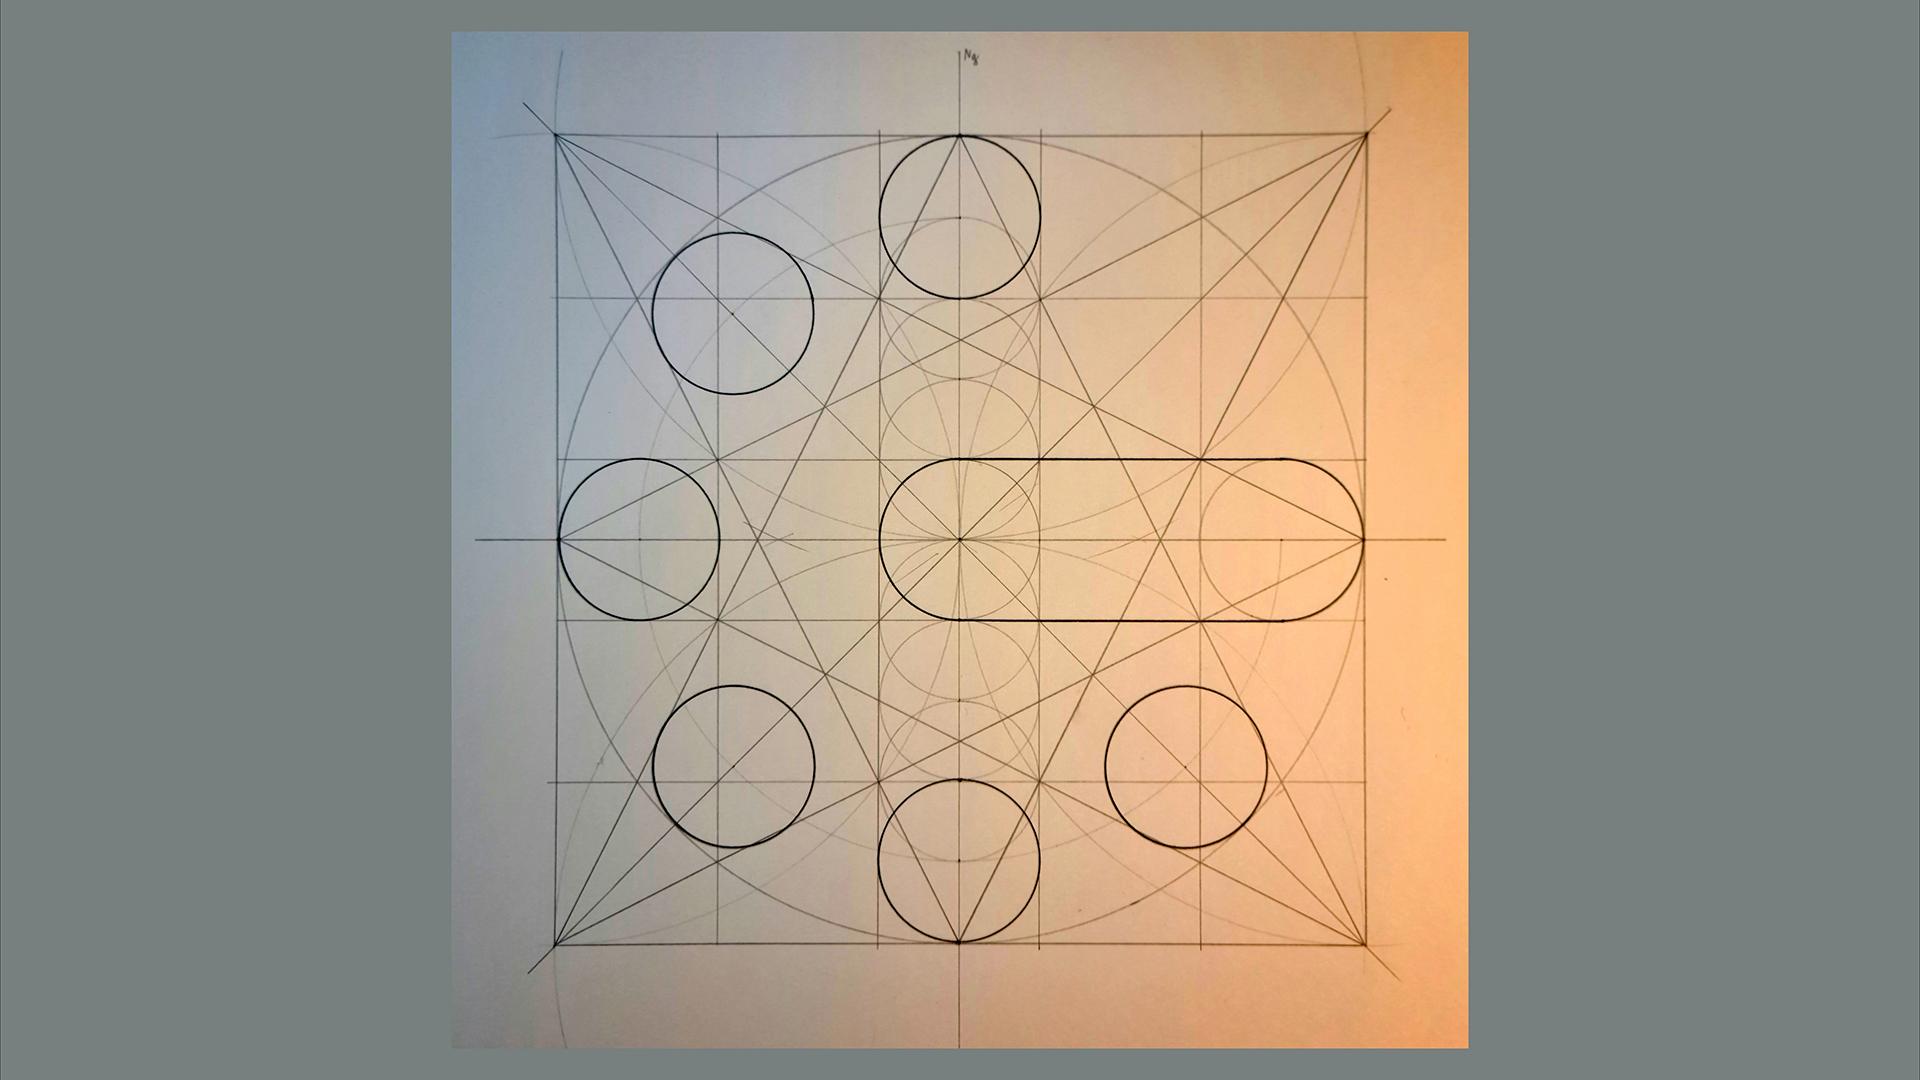 LOGO drawing2.jpg